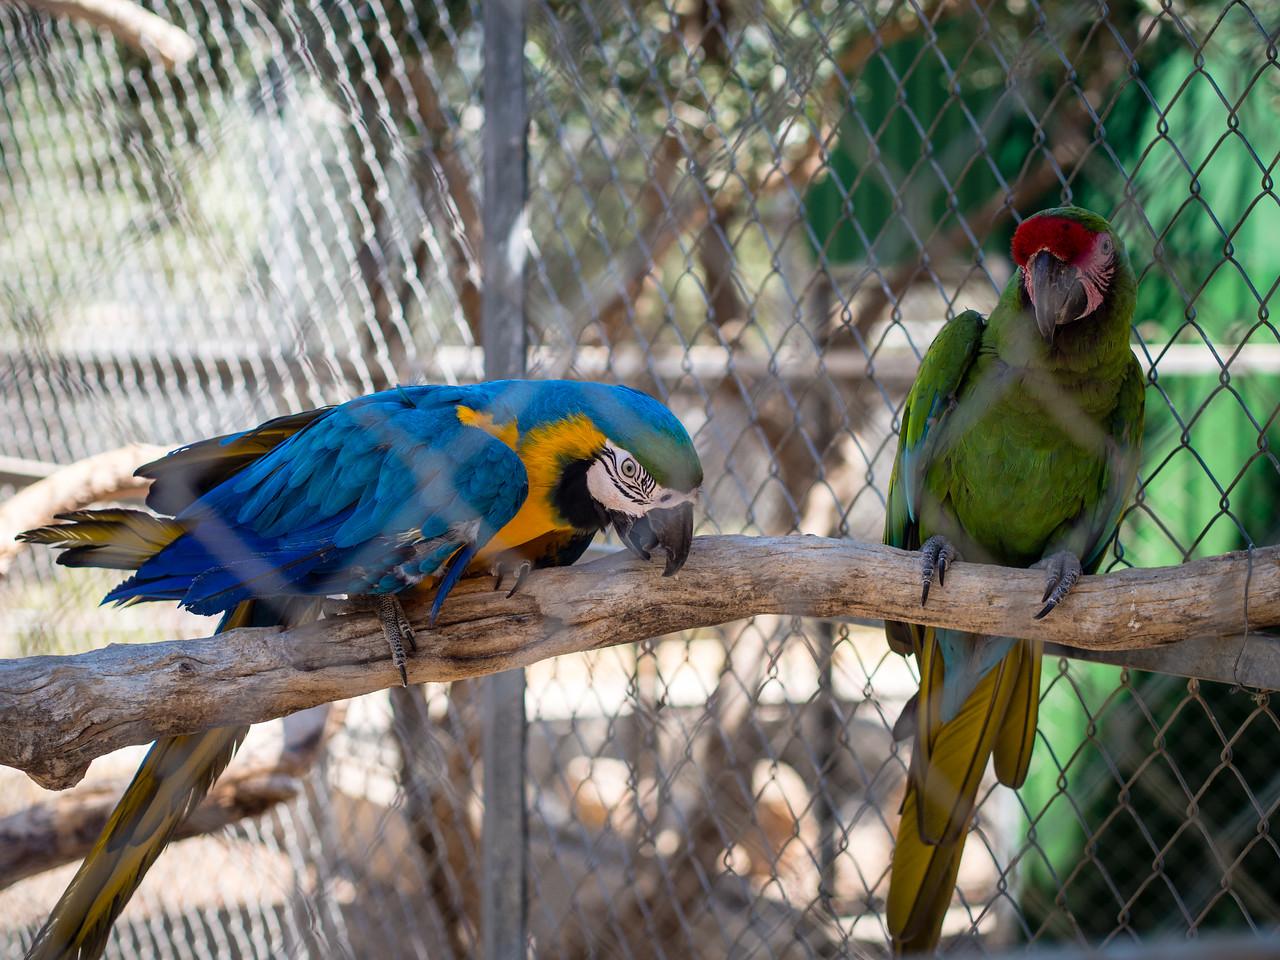 Two Ara parrots in Melios Zoo